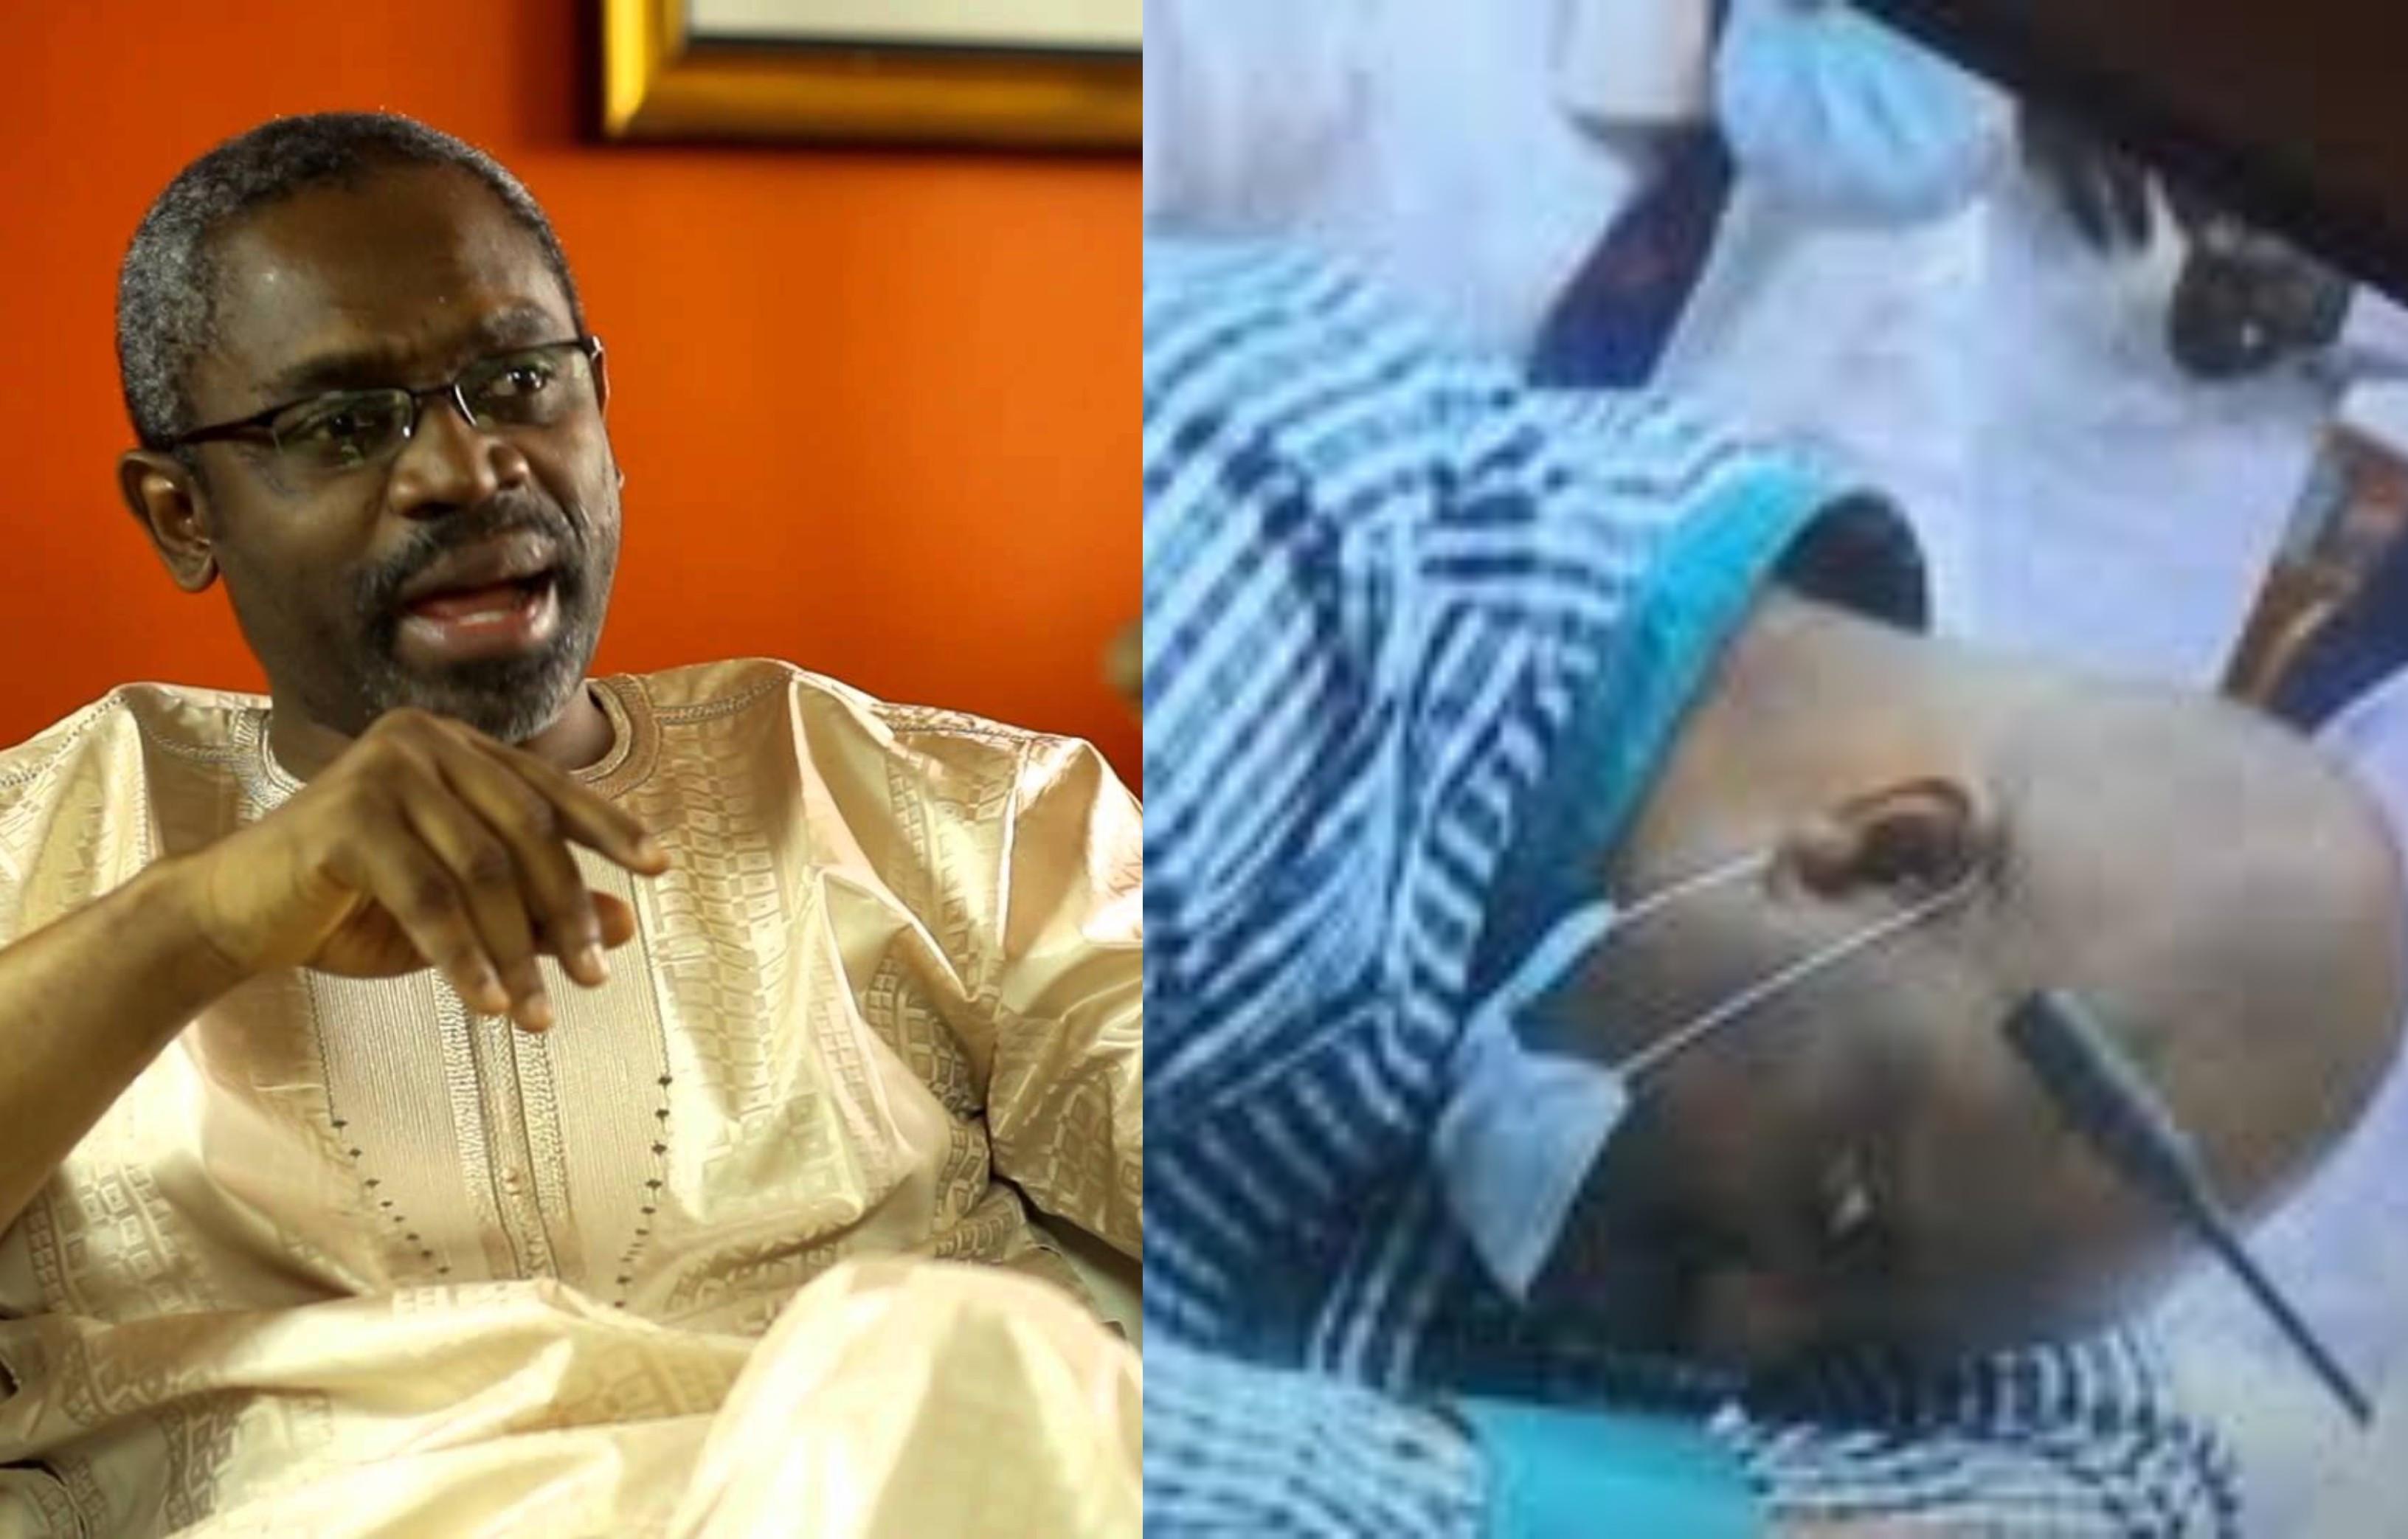 Acting NDDC MD, Kemebradikumo Pondei will no longer appear before probe panel - Gbajabiamila